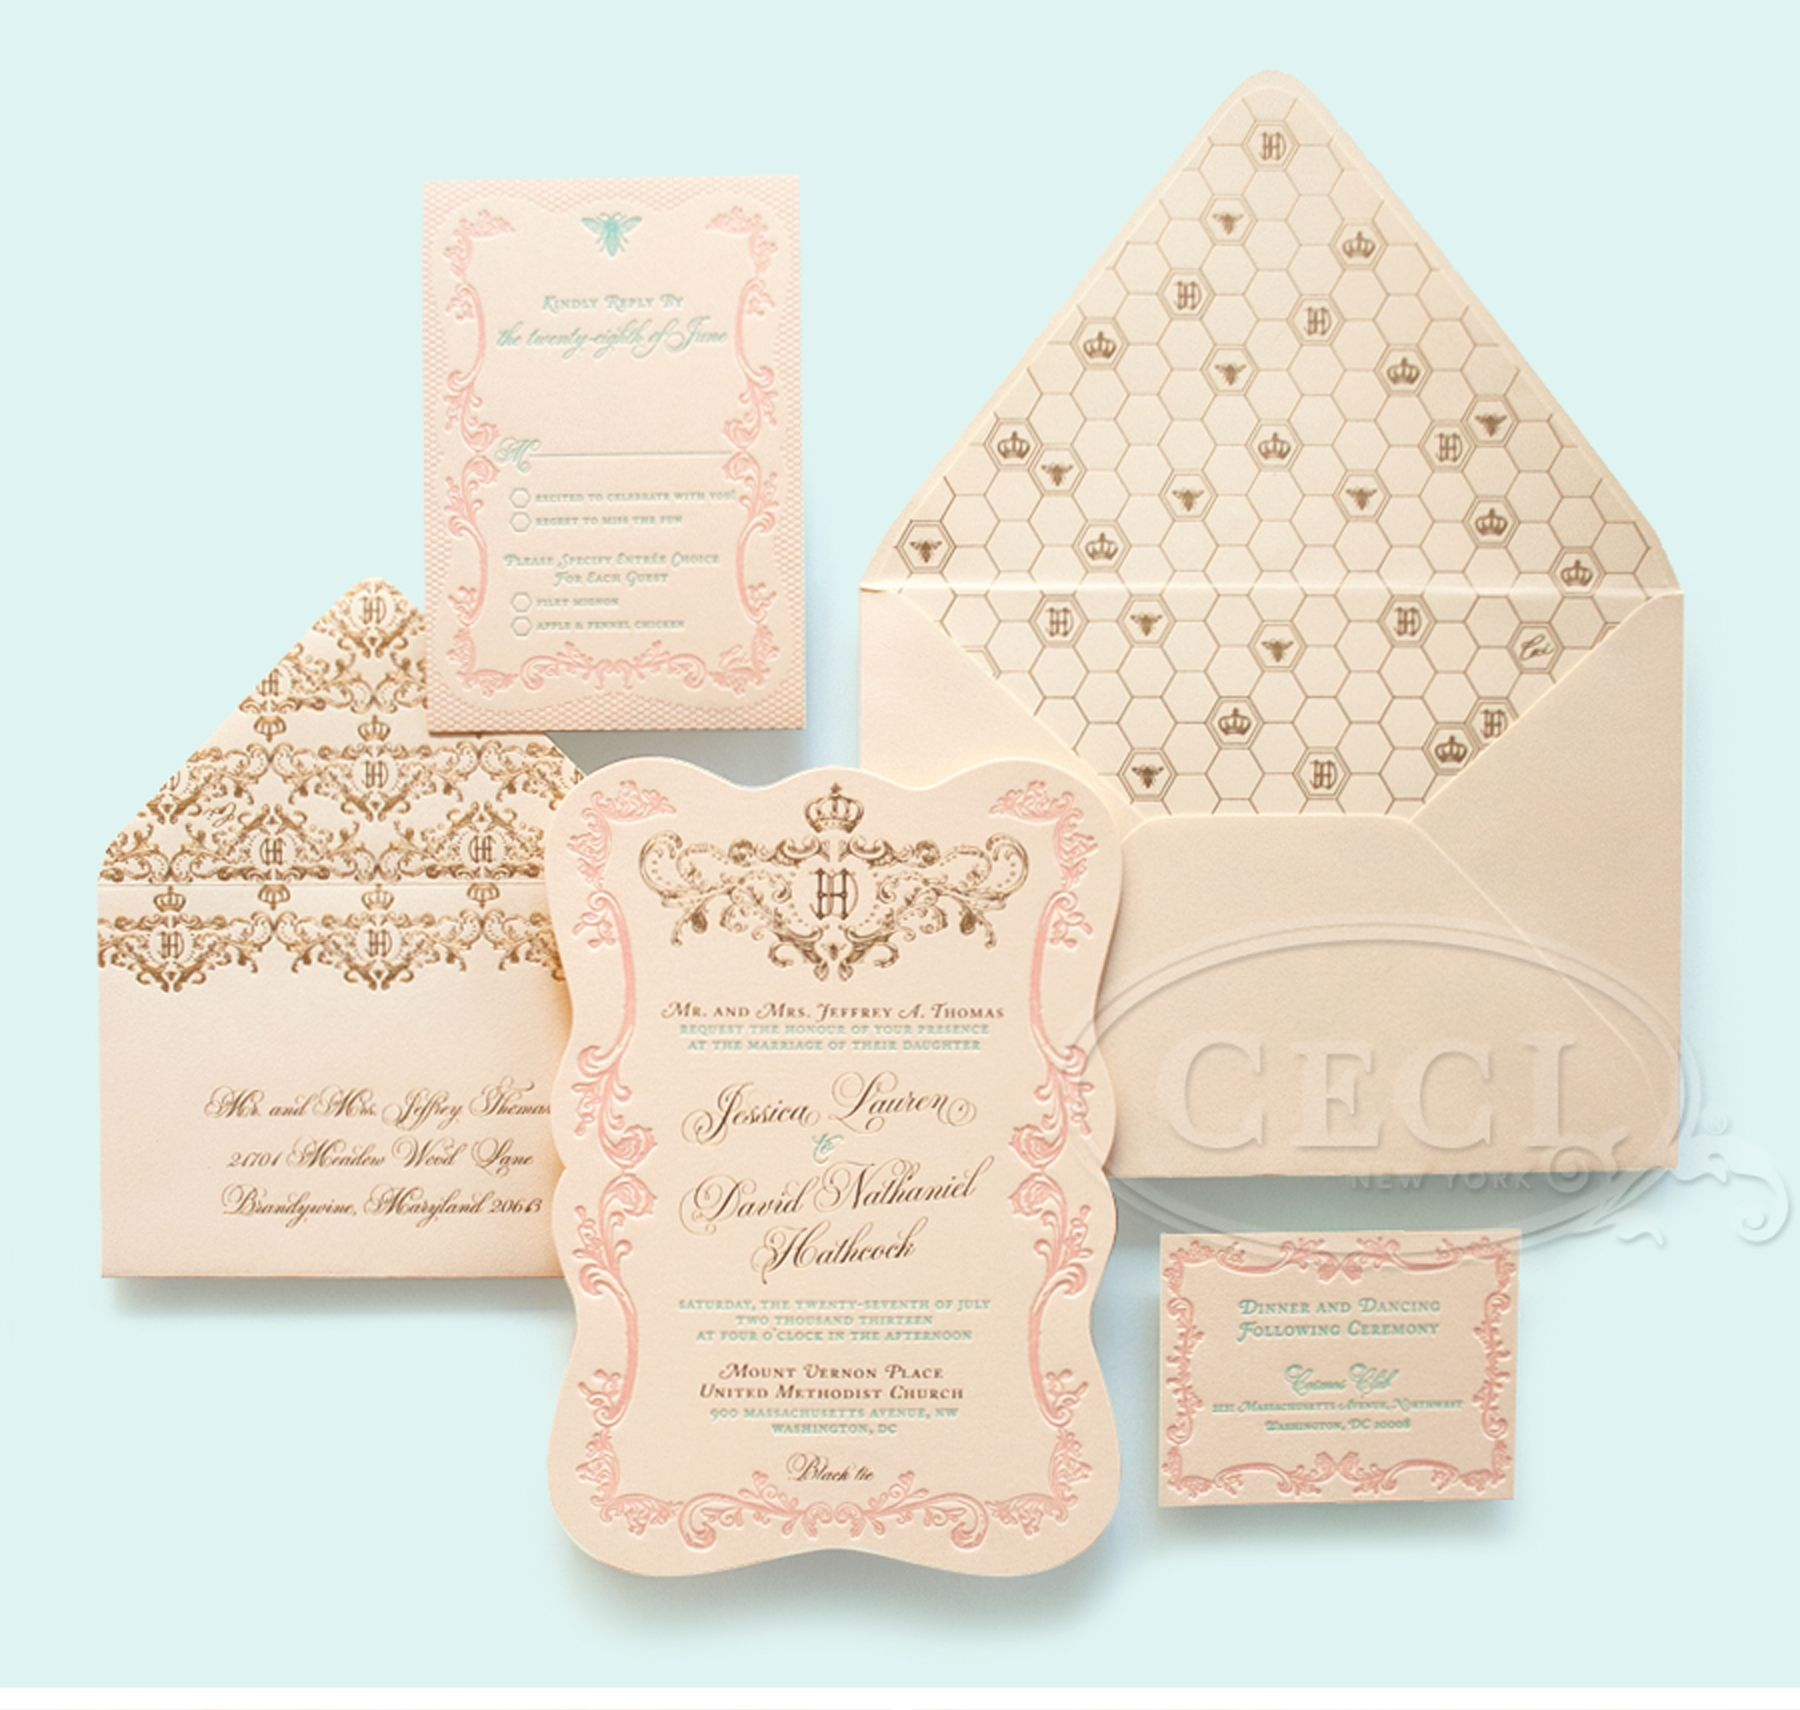 Dorable Honey Bee Themed Wedding Mold - The Wedding Ideas ...